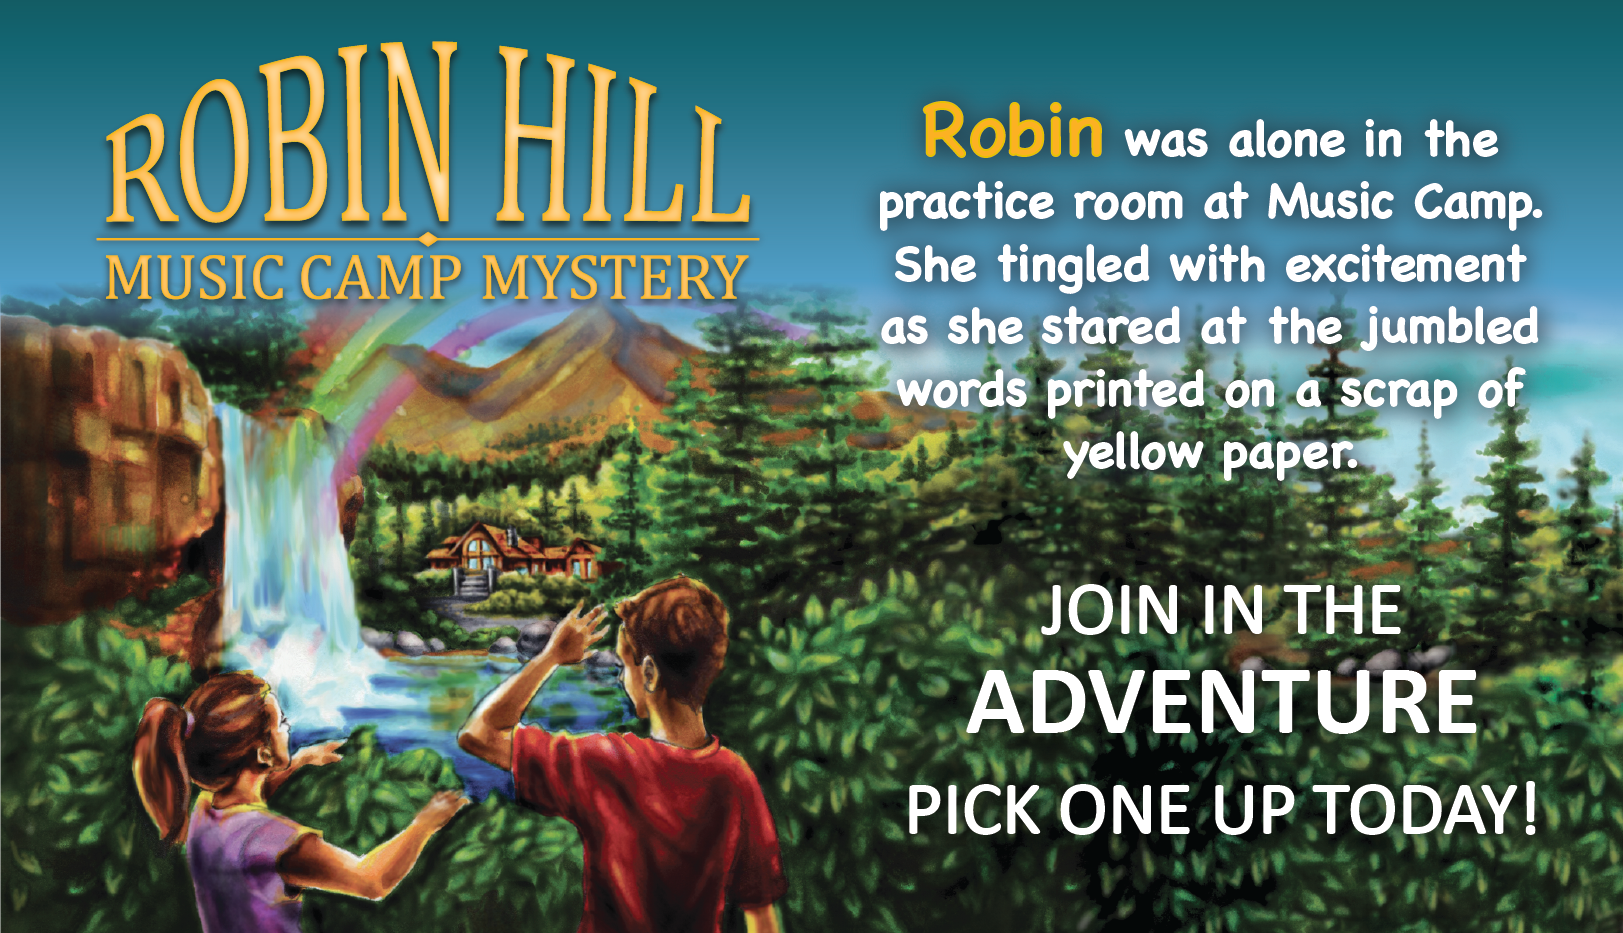 Robin Hill: Music Camp Mystery